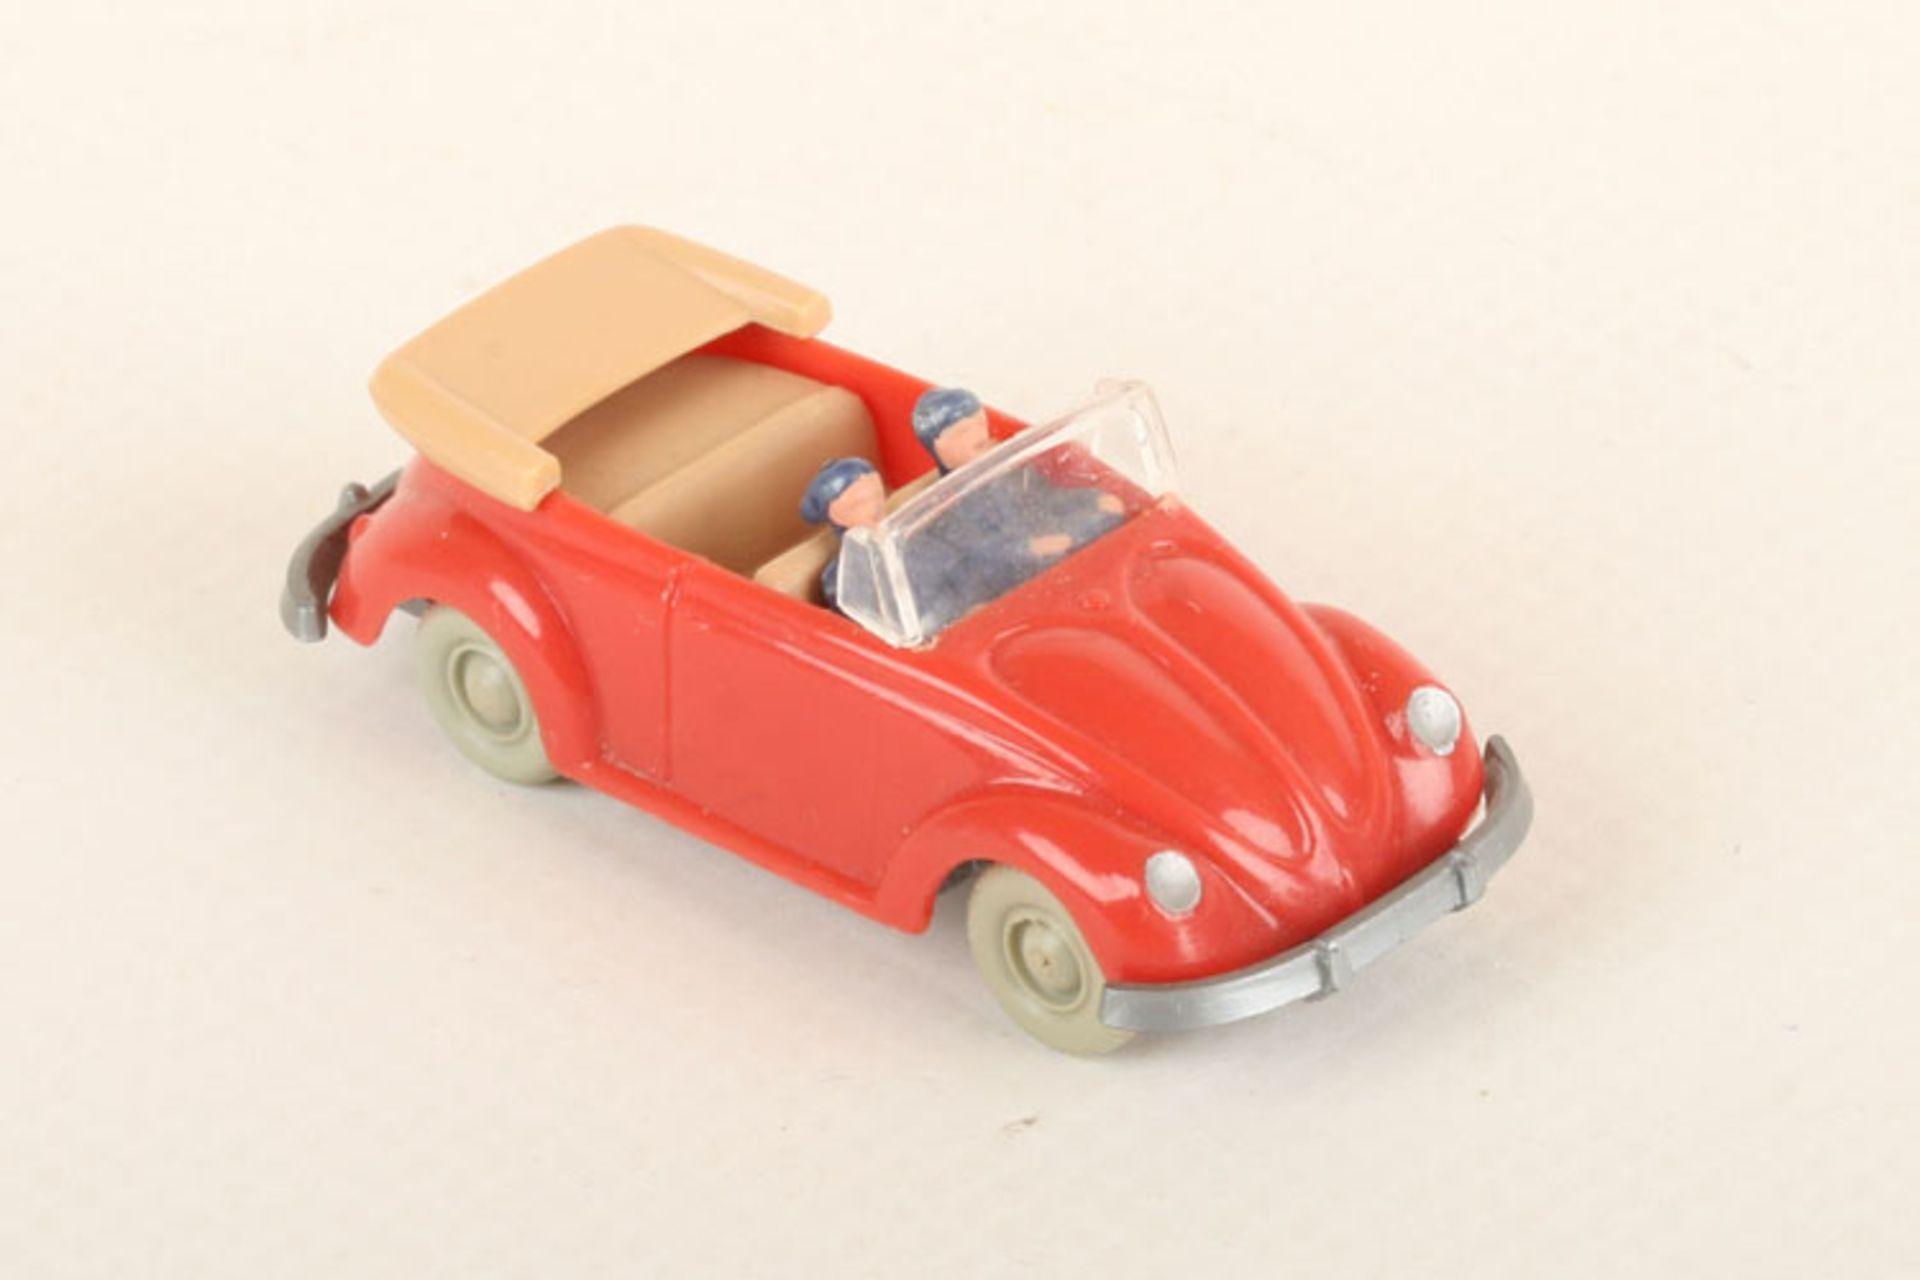 Los 1022 - Wiking VW Käfer Cabrio rosé 33/3j, IE beige, neuwertig